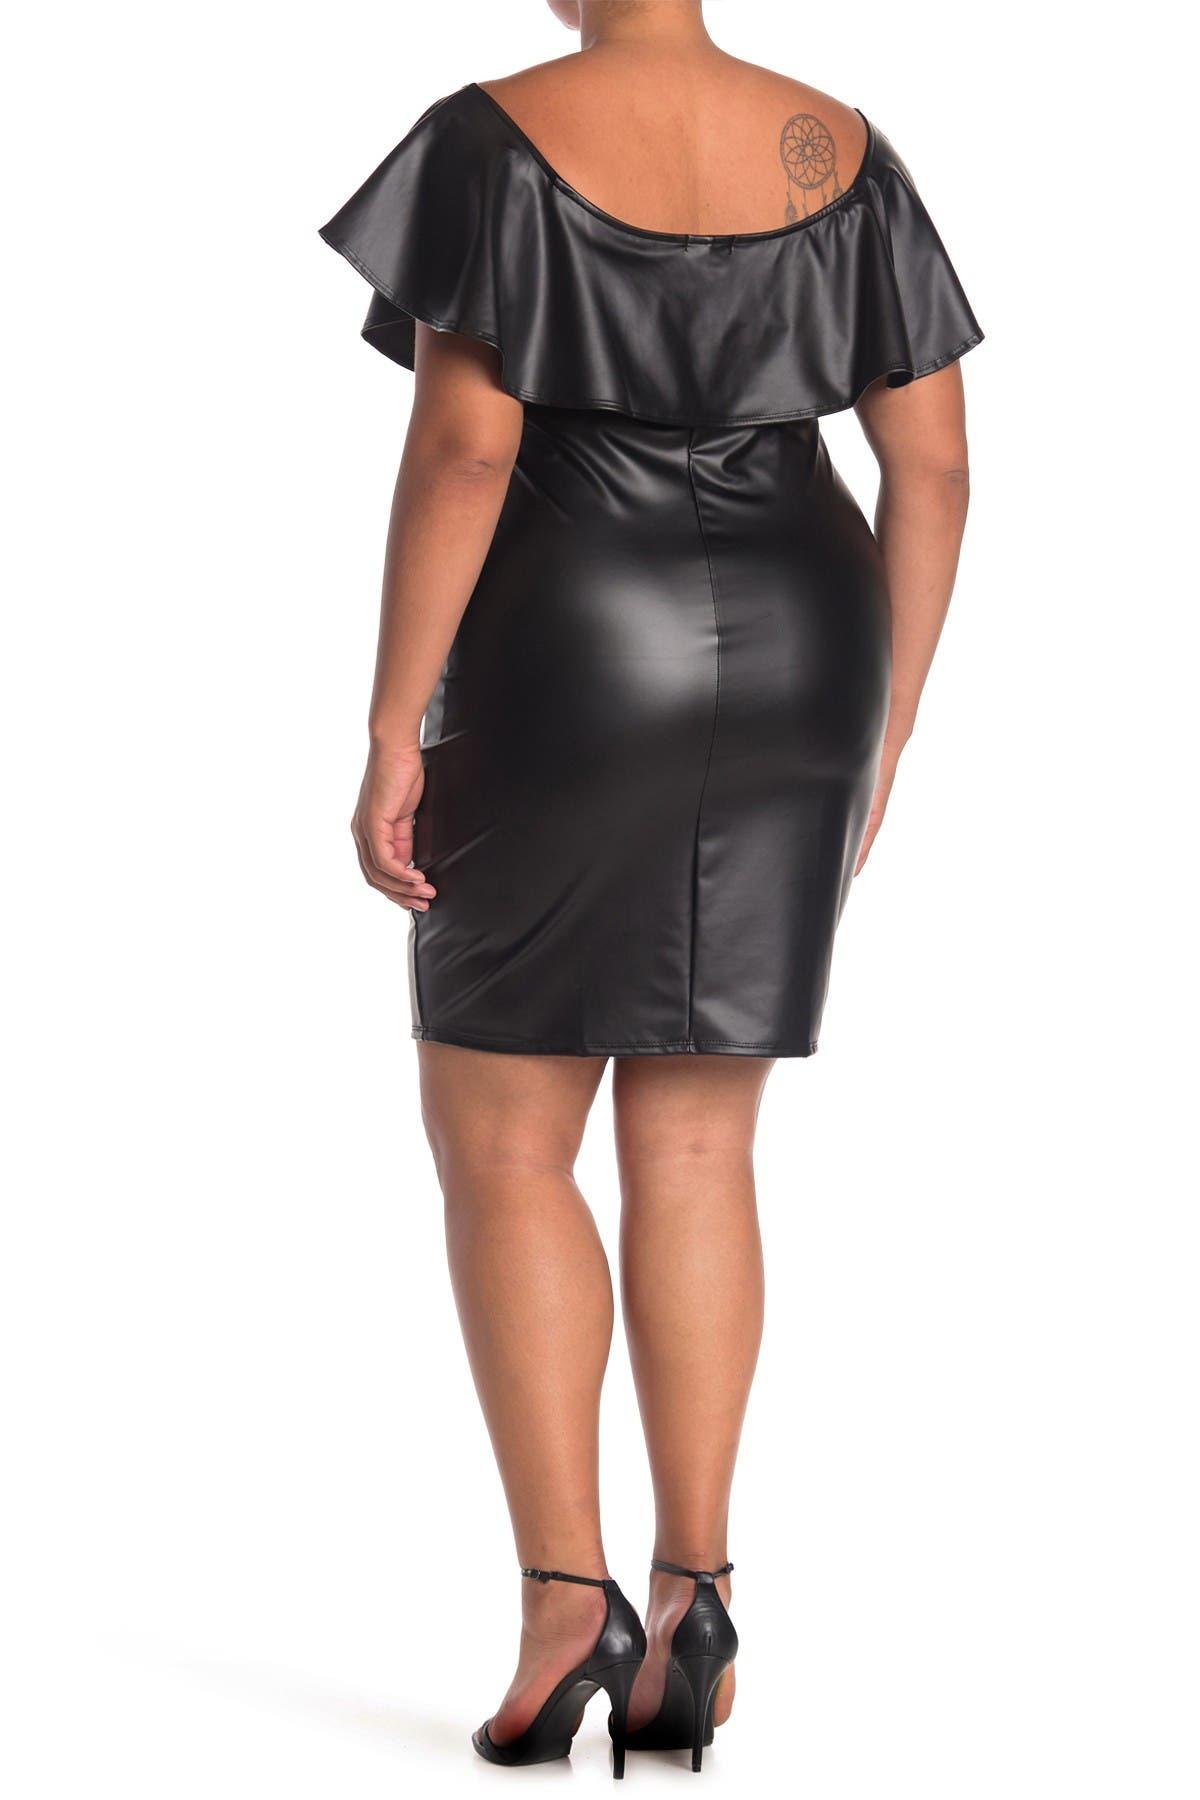 Curvy Sense Faux Leather Ruffle Dress